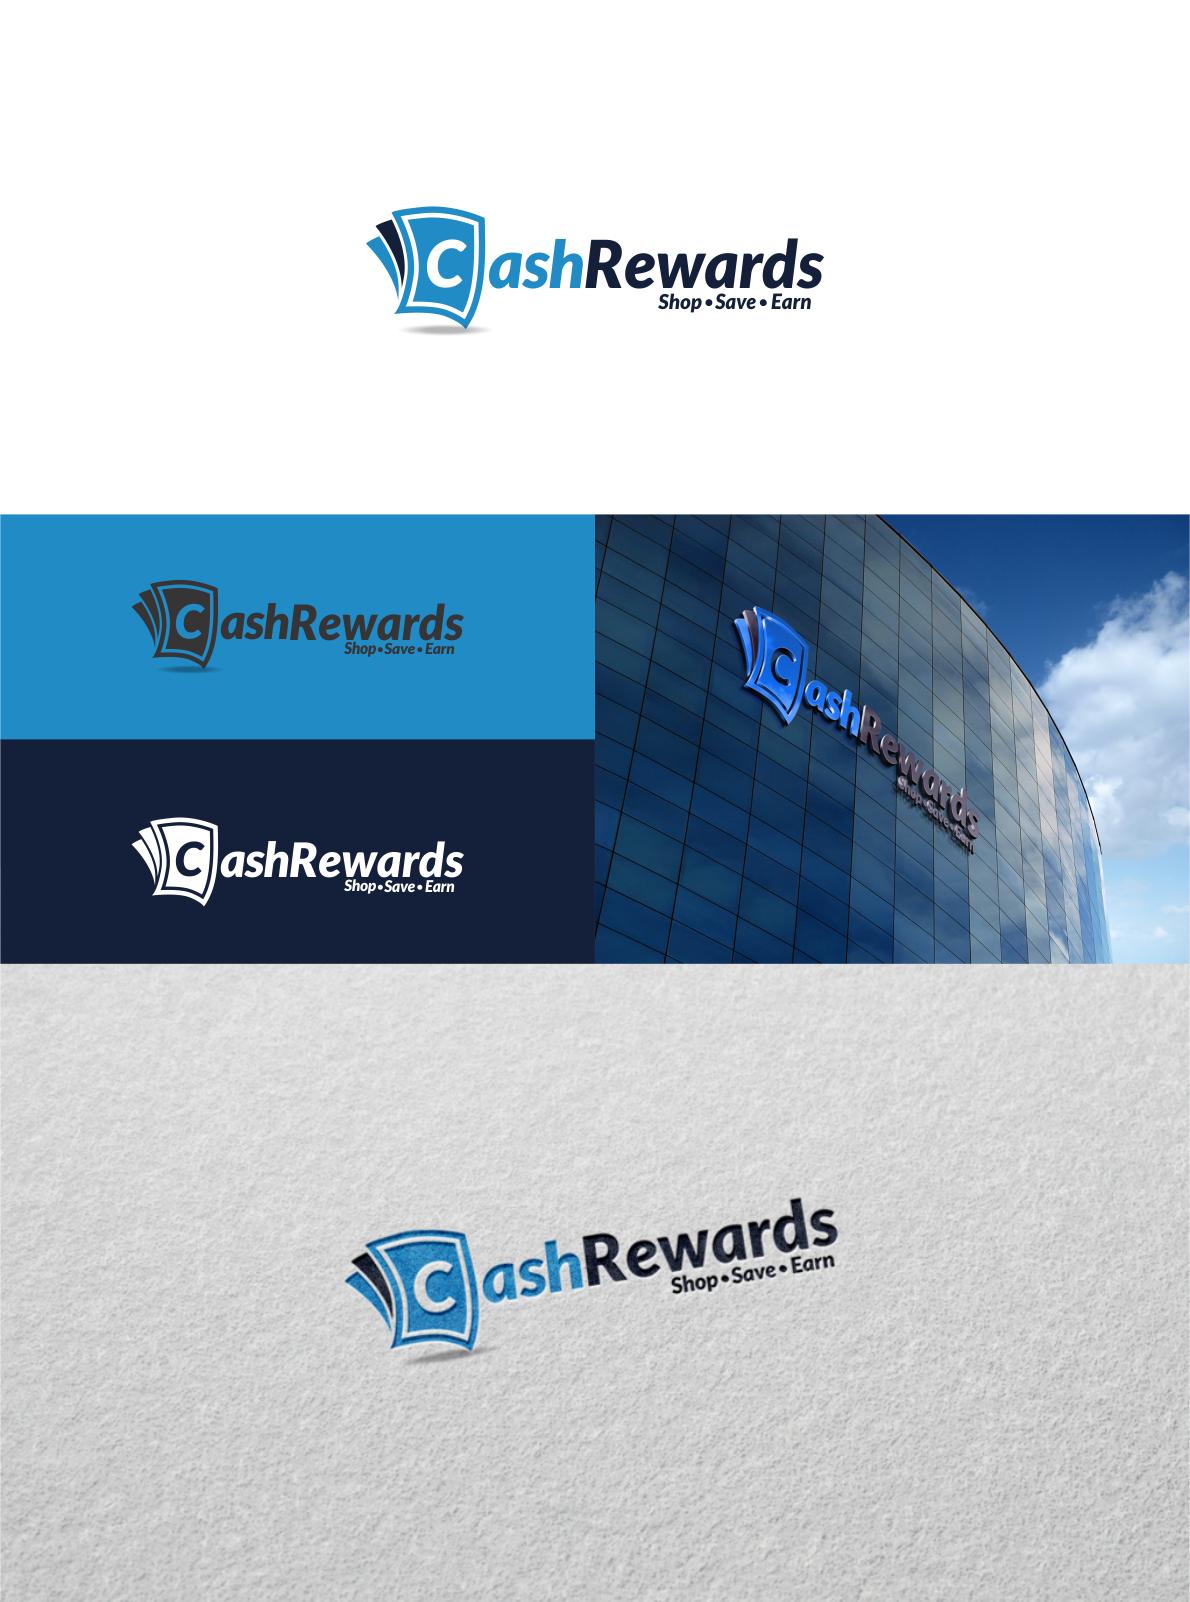 Create the new logo for Cash Rewards